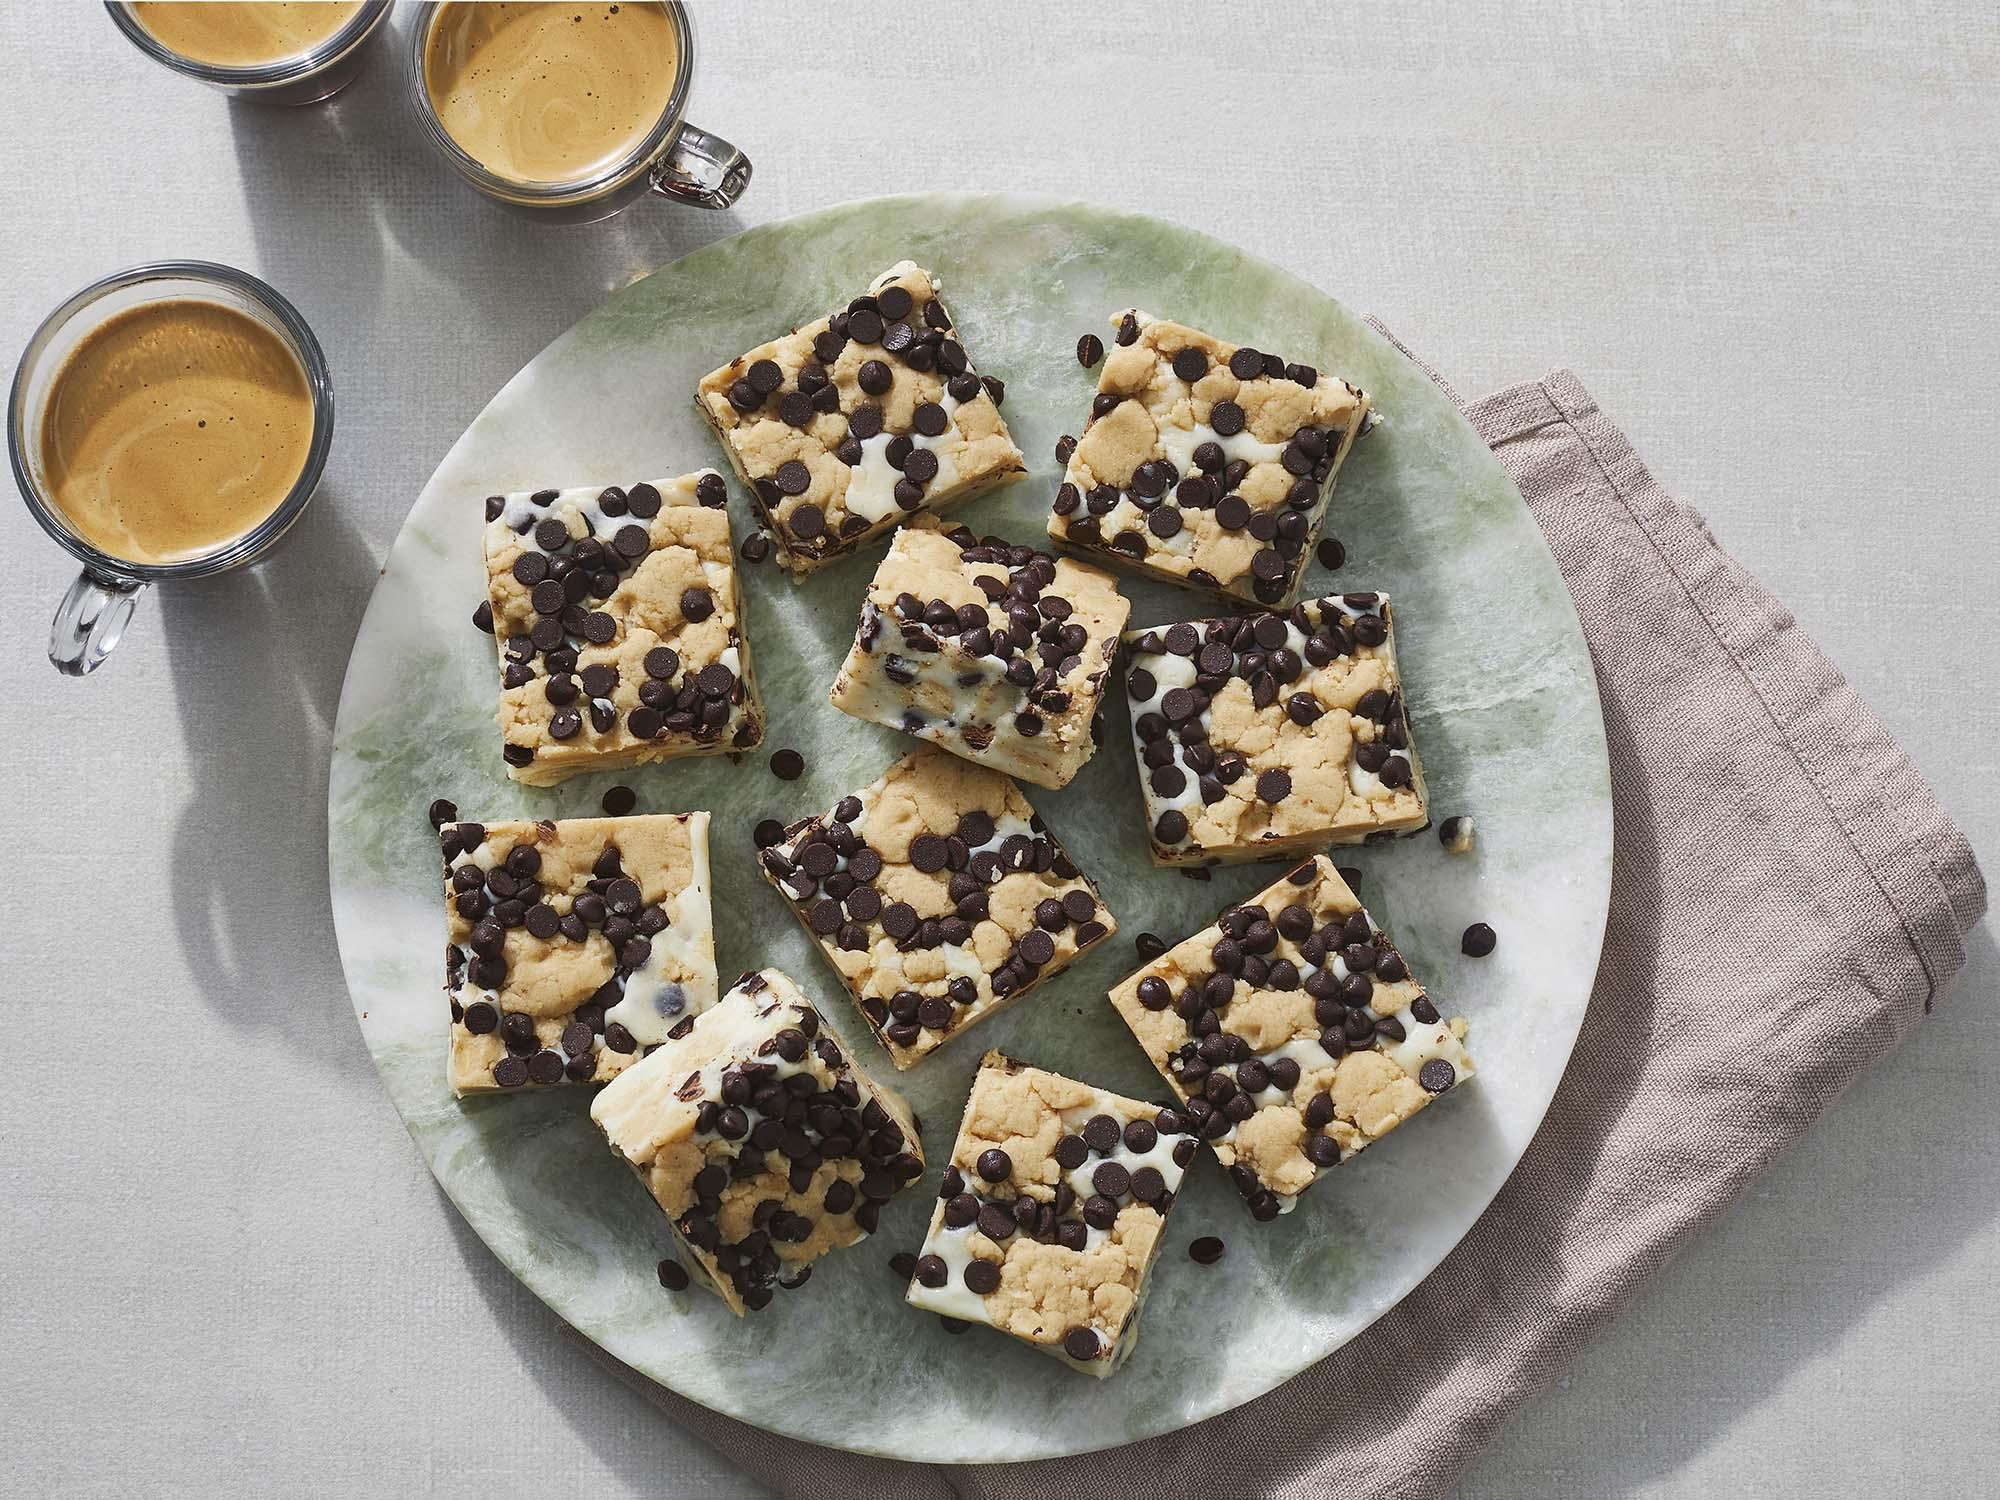 mr - Chocolate Chip Cookie Dough Fudge Image